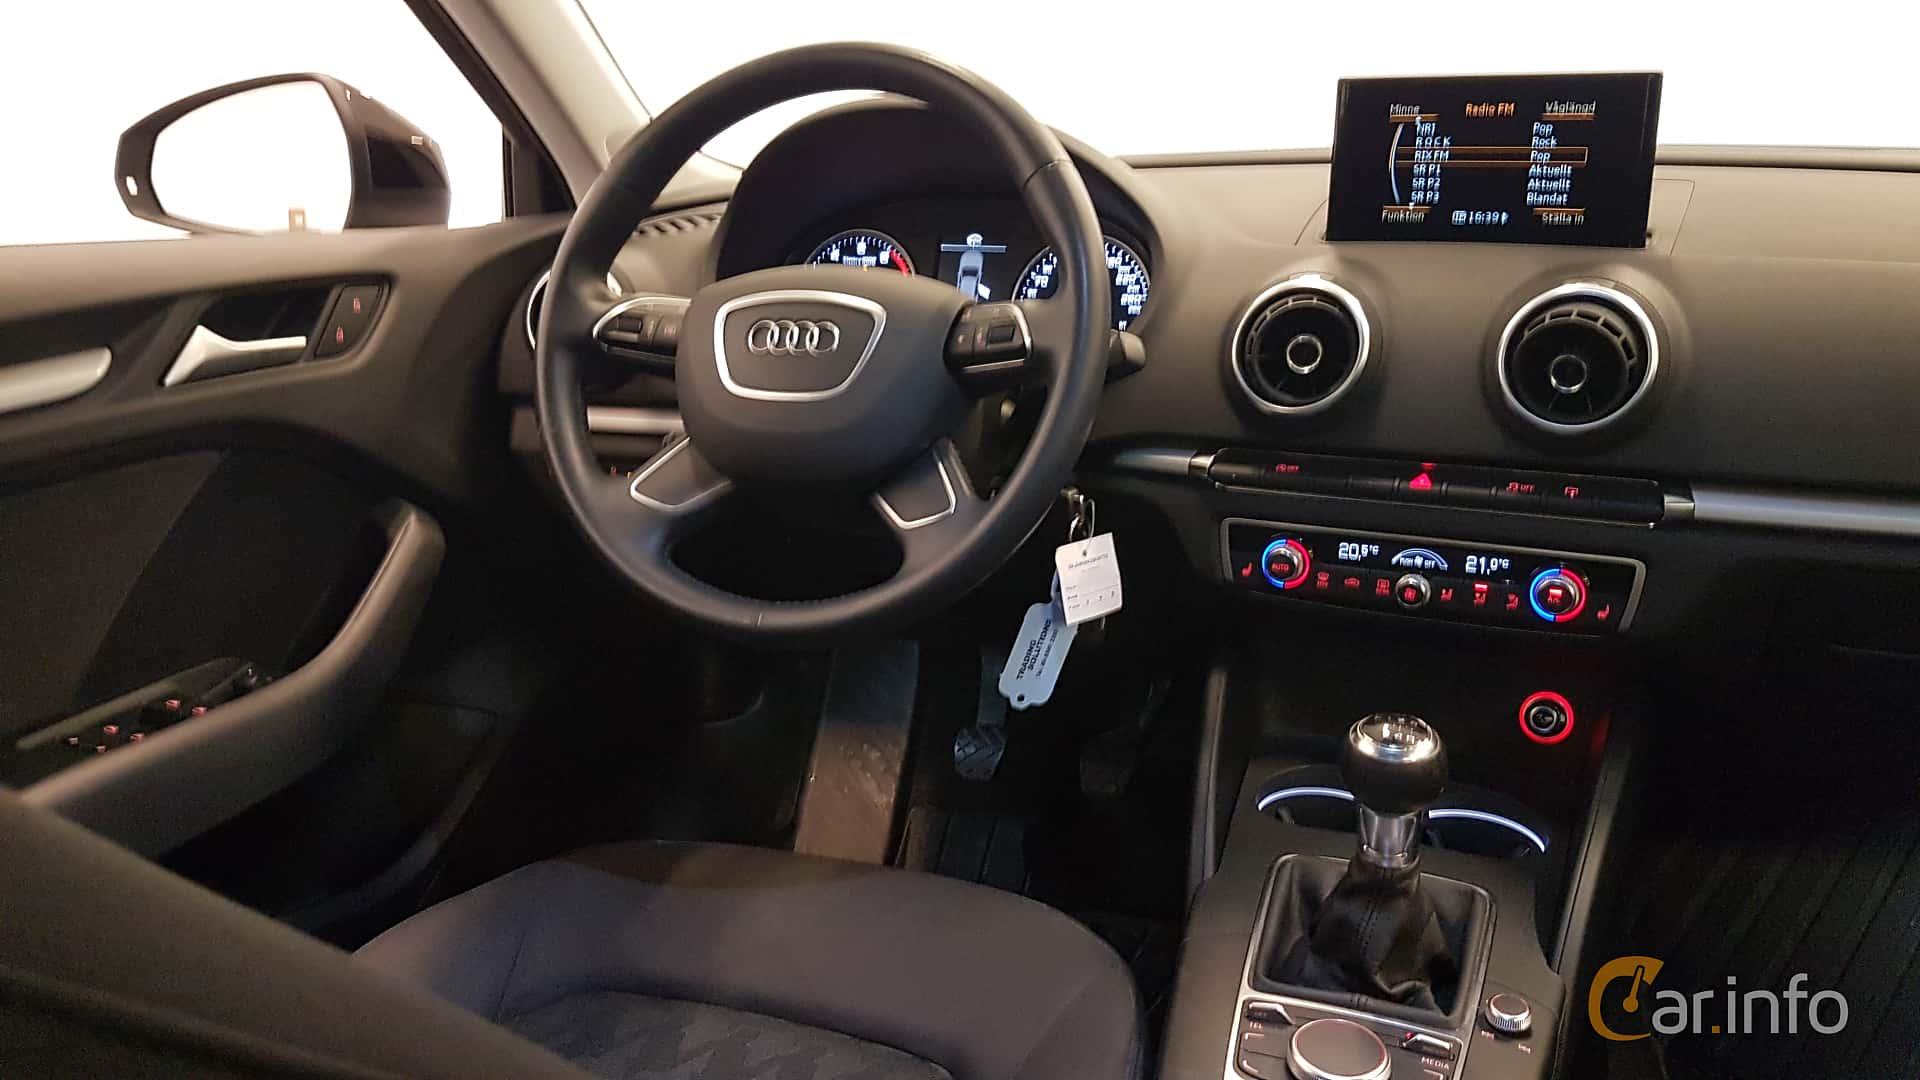 Audi A3 Sportback 1.2 TFSI Manual, 110hp, 2016